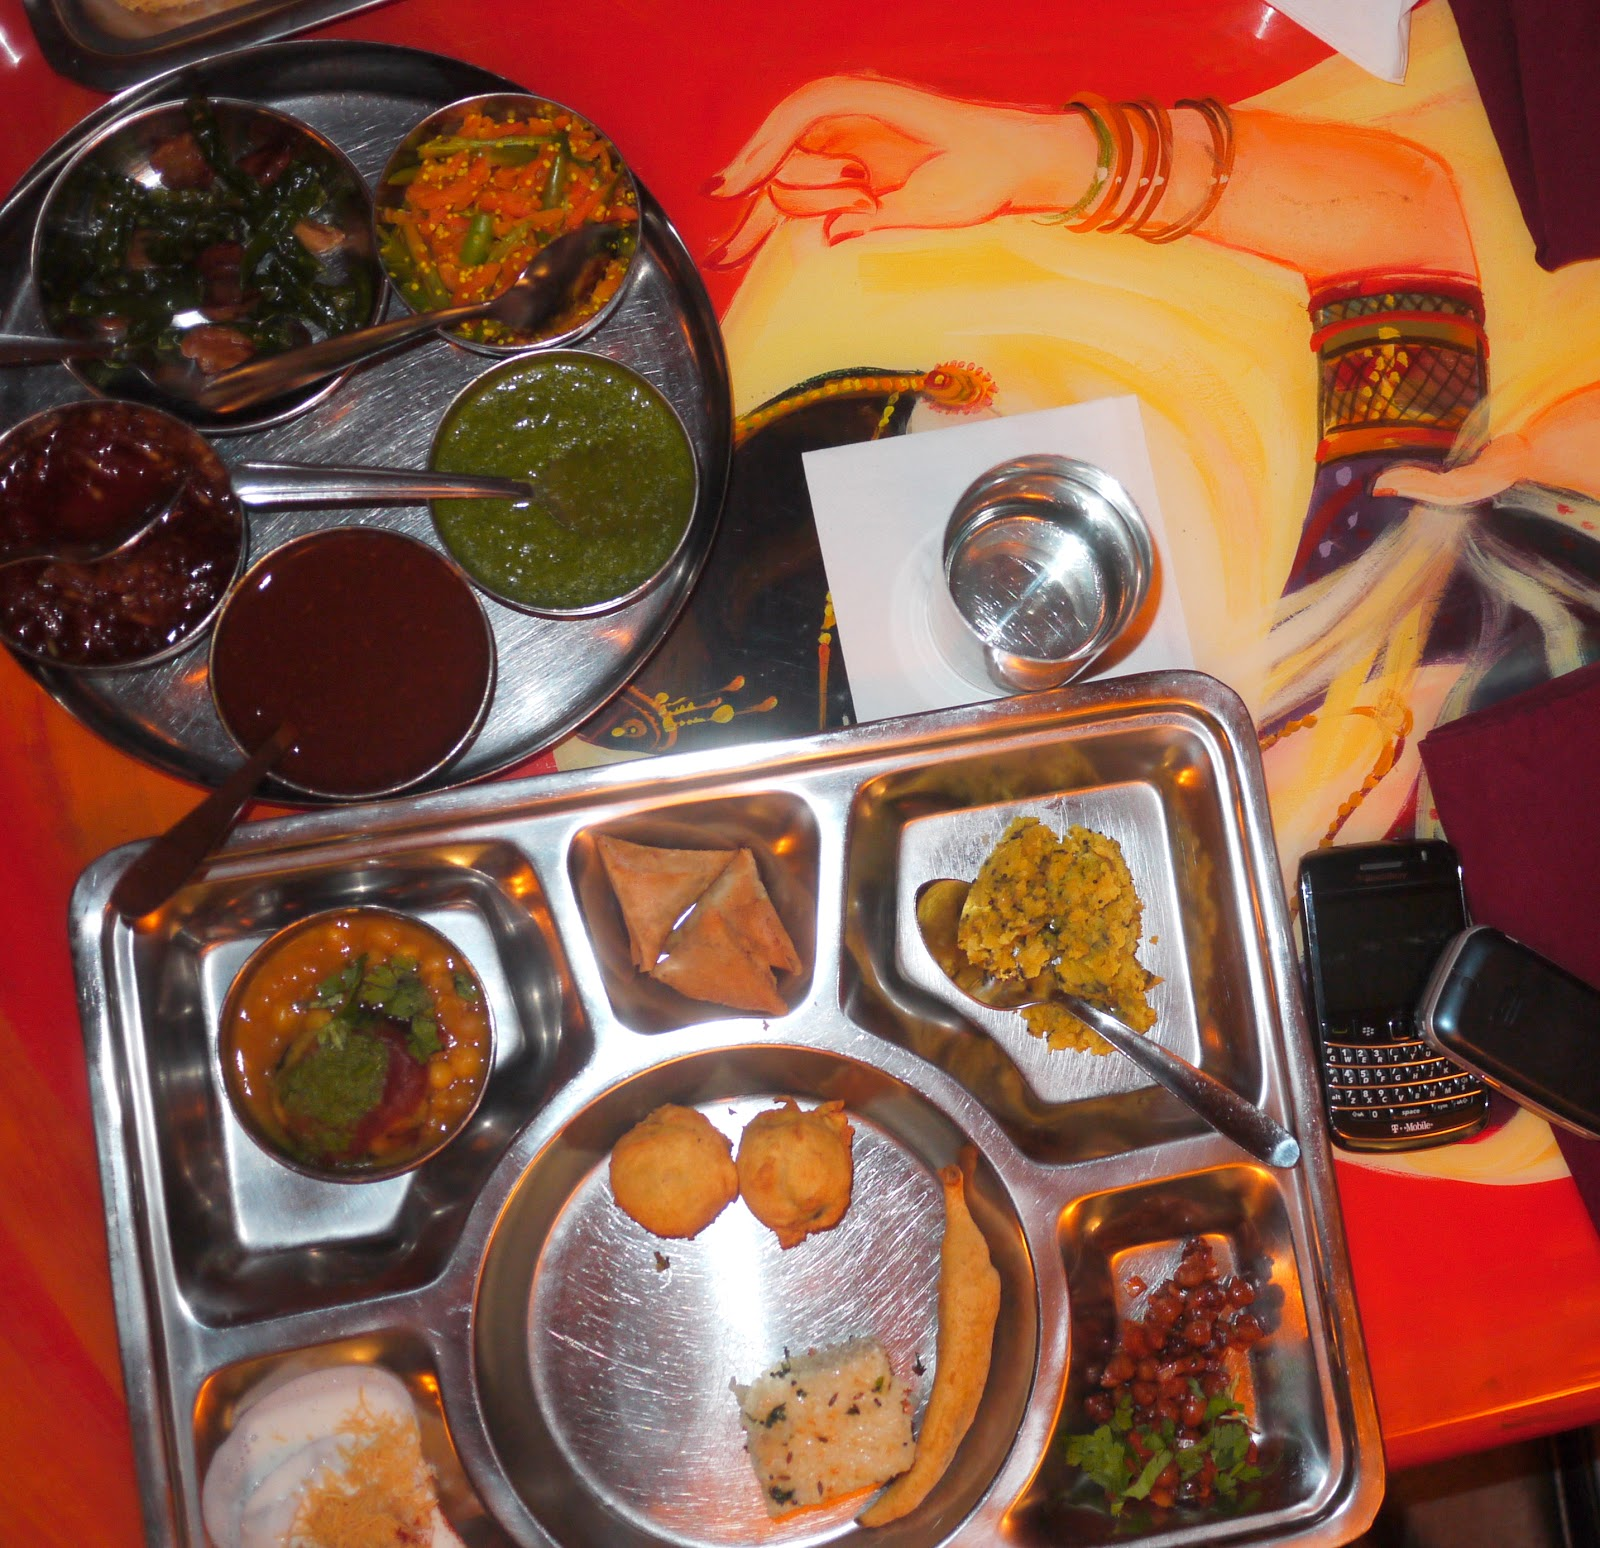 Vatan Is A Vegetarian Indian Restaurant That Serves Gujarati Food The Interior Ious Tastefully Designed To Look Like Village Courtyard In Western